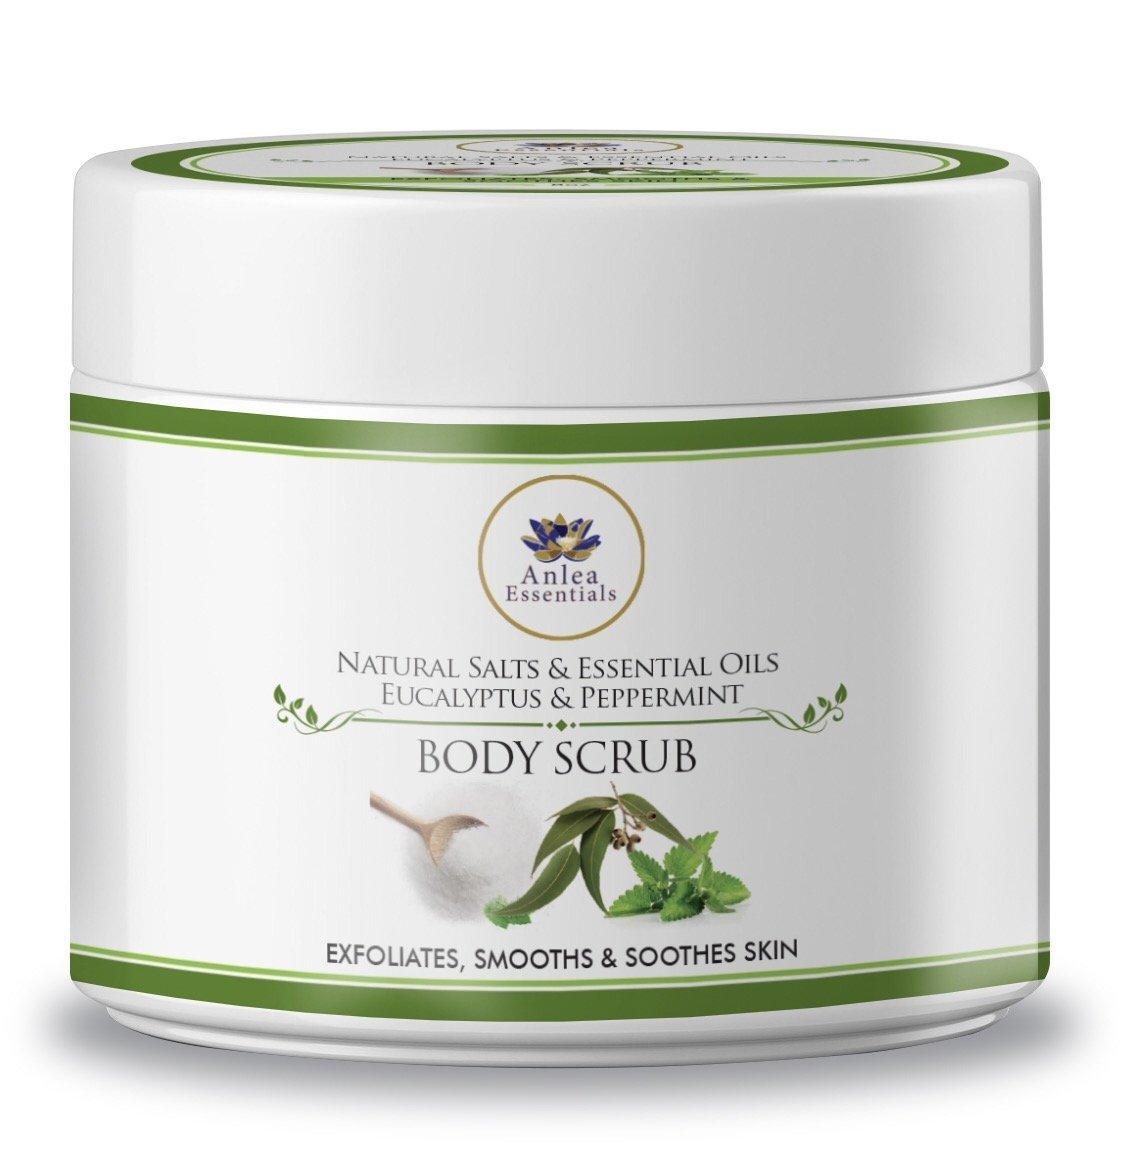 Anlea Essentials Eucalyptus & Peppermint Exfoliating Body Scrub 8oz